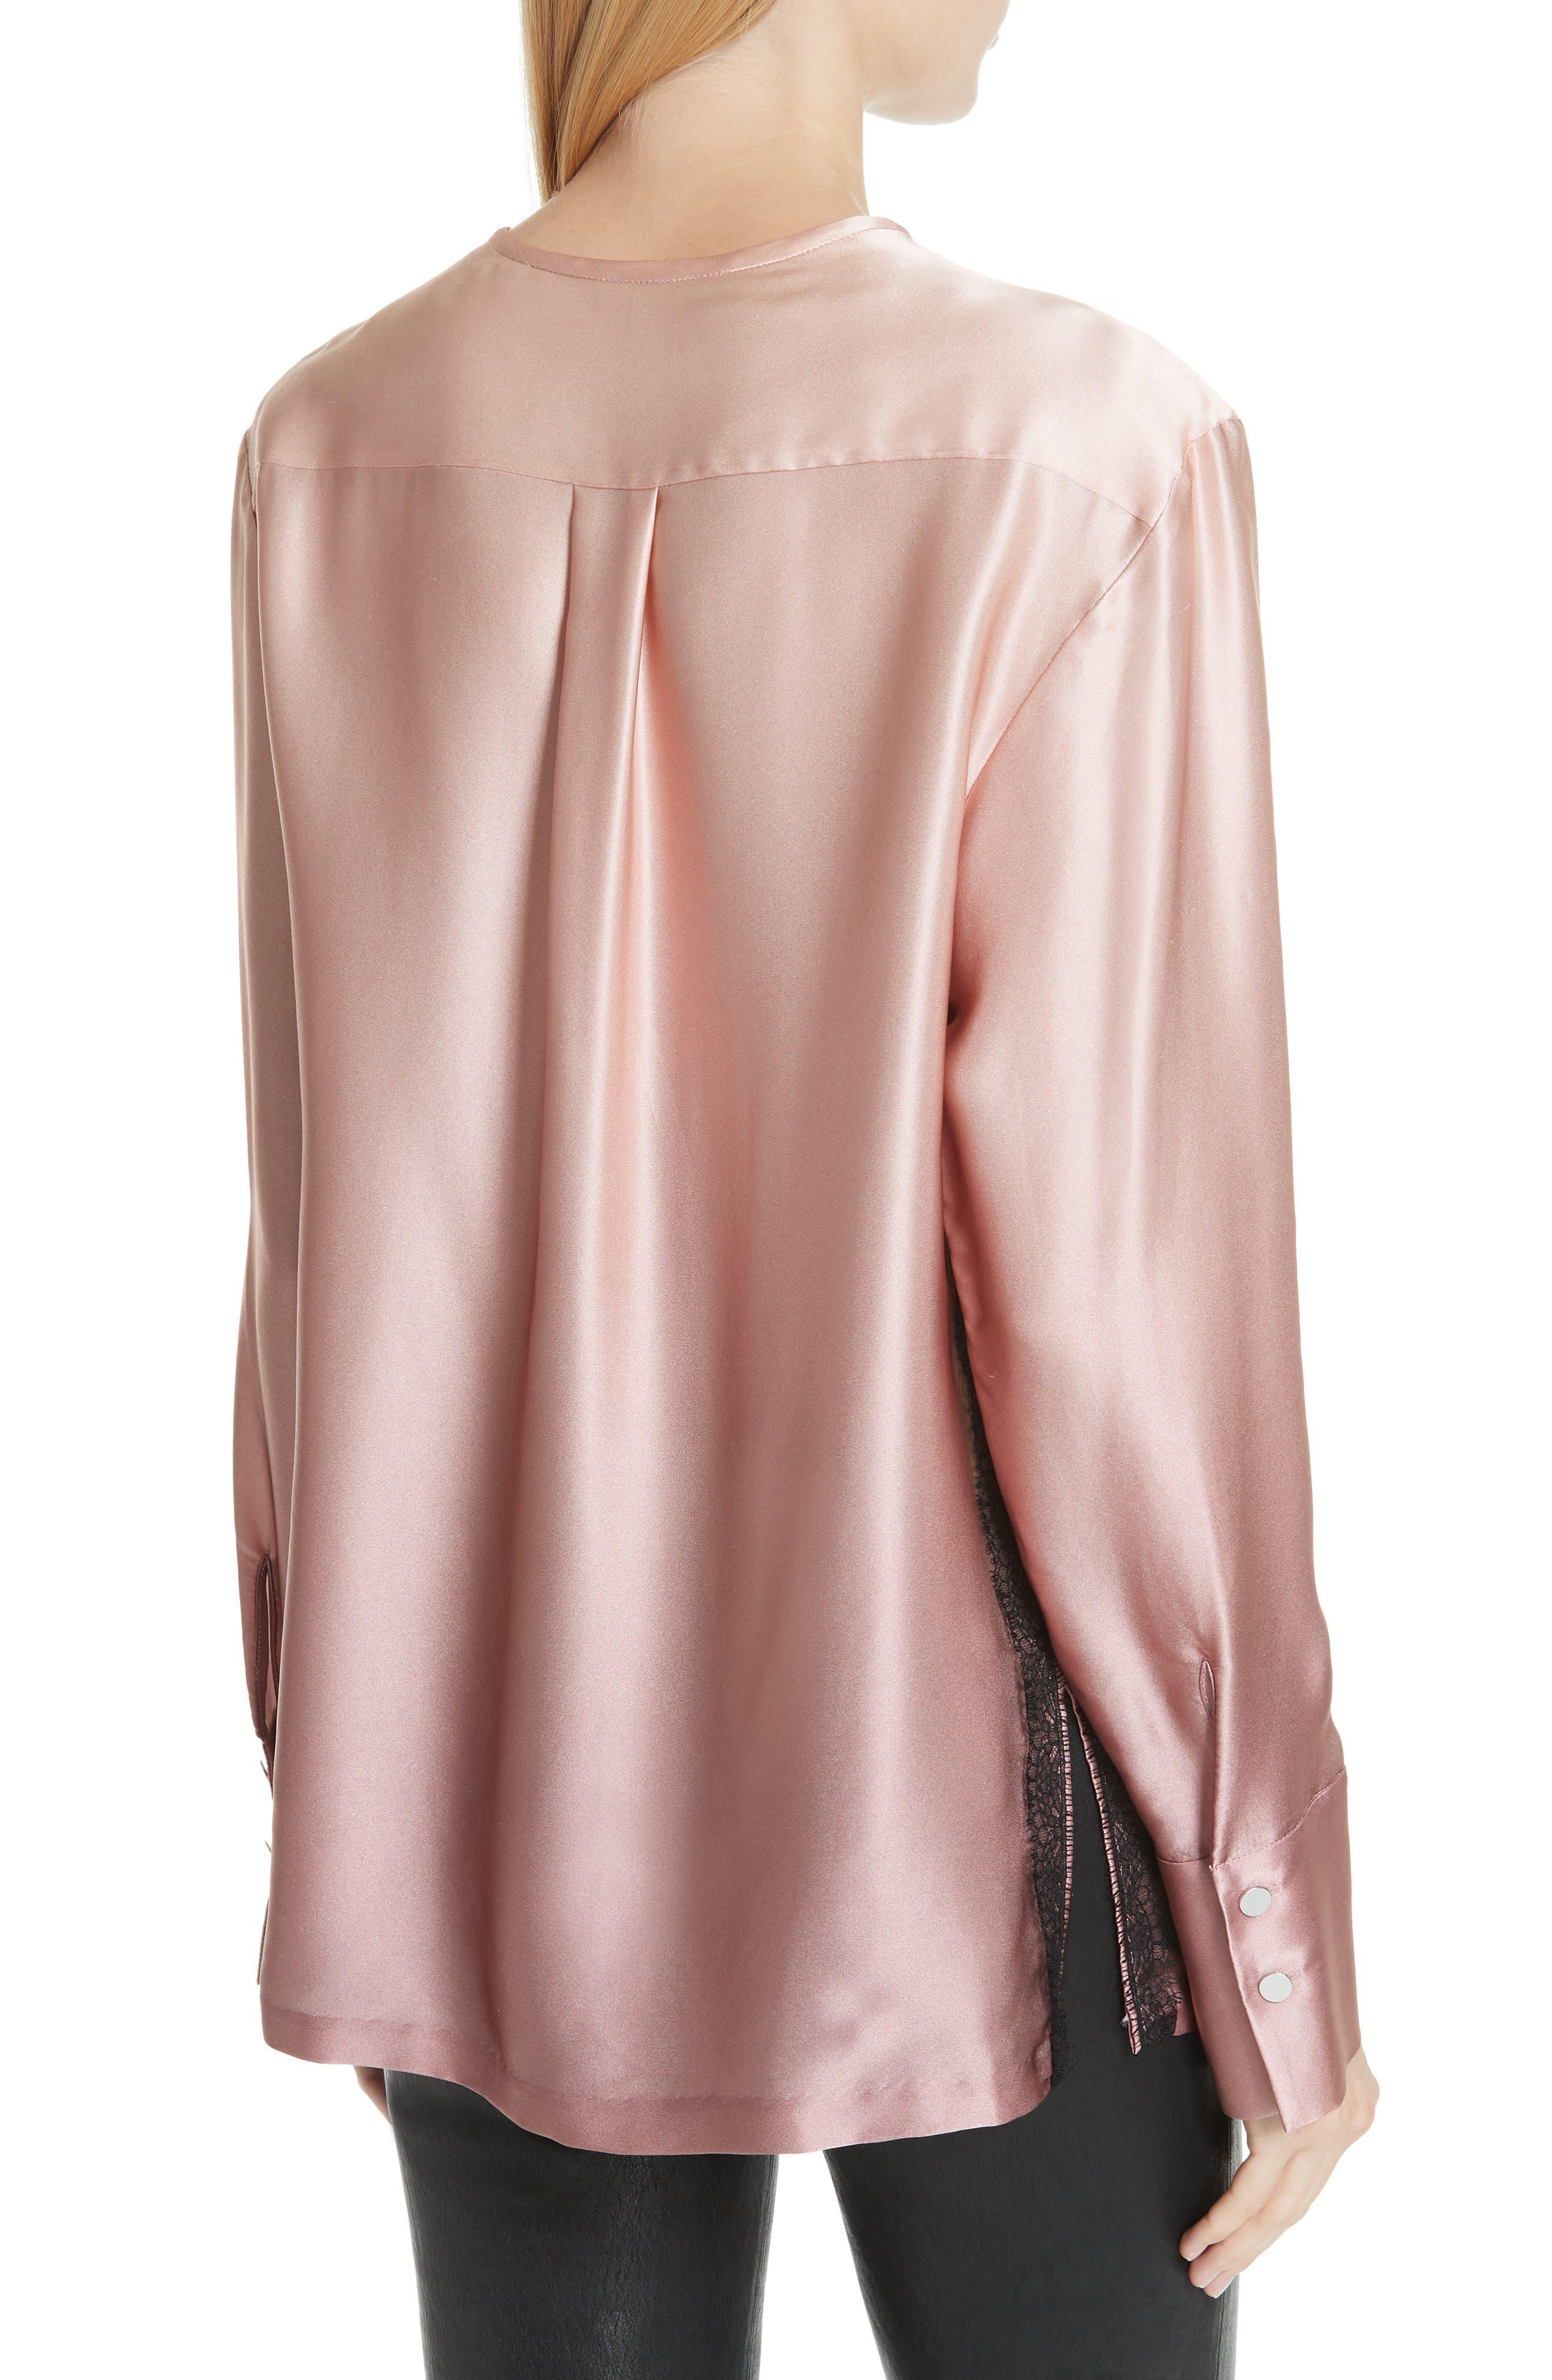 GREY Jason Wu Ombré Silk Shirt,                             Alternate thumbnail 2, color,                             DESERT ROSE